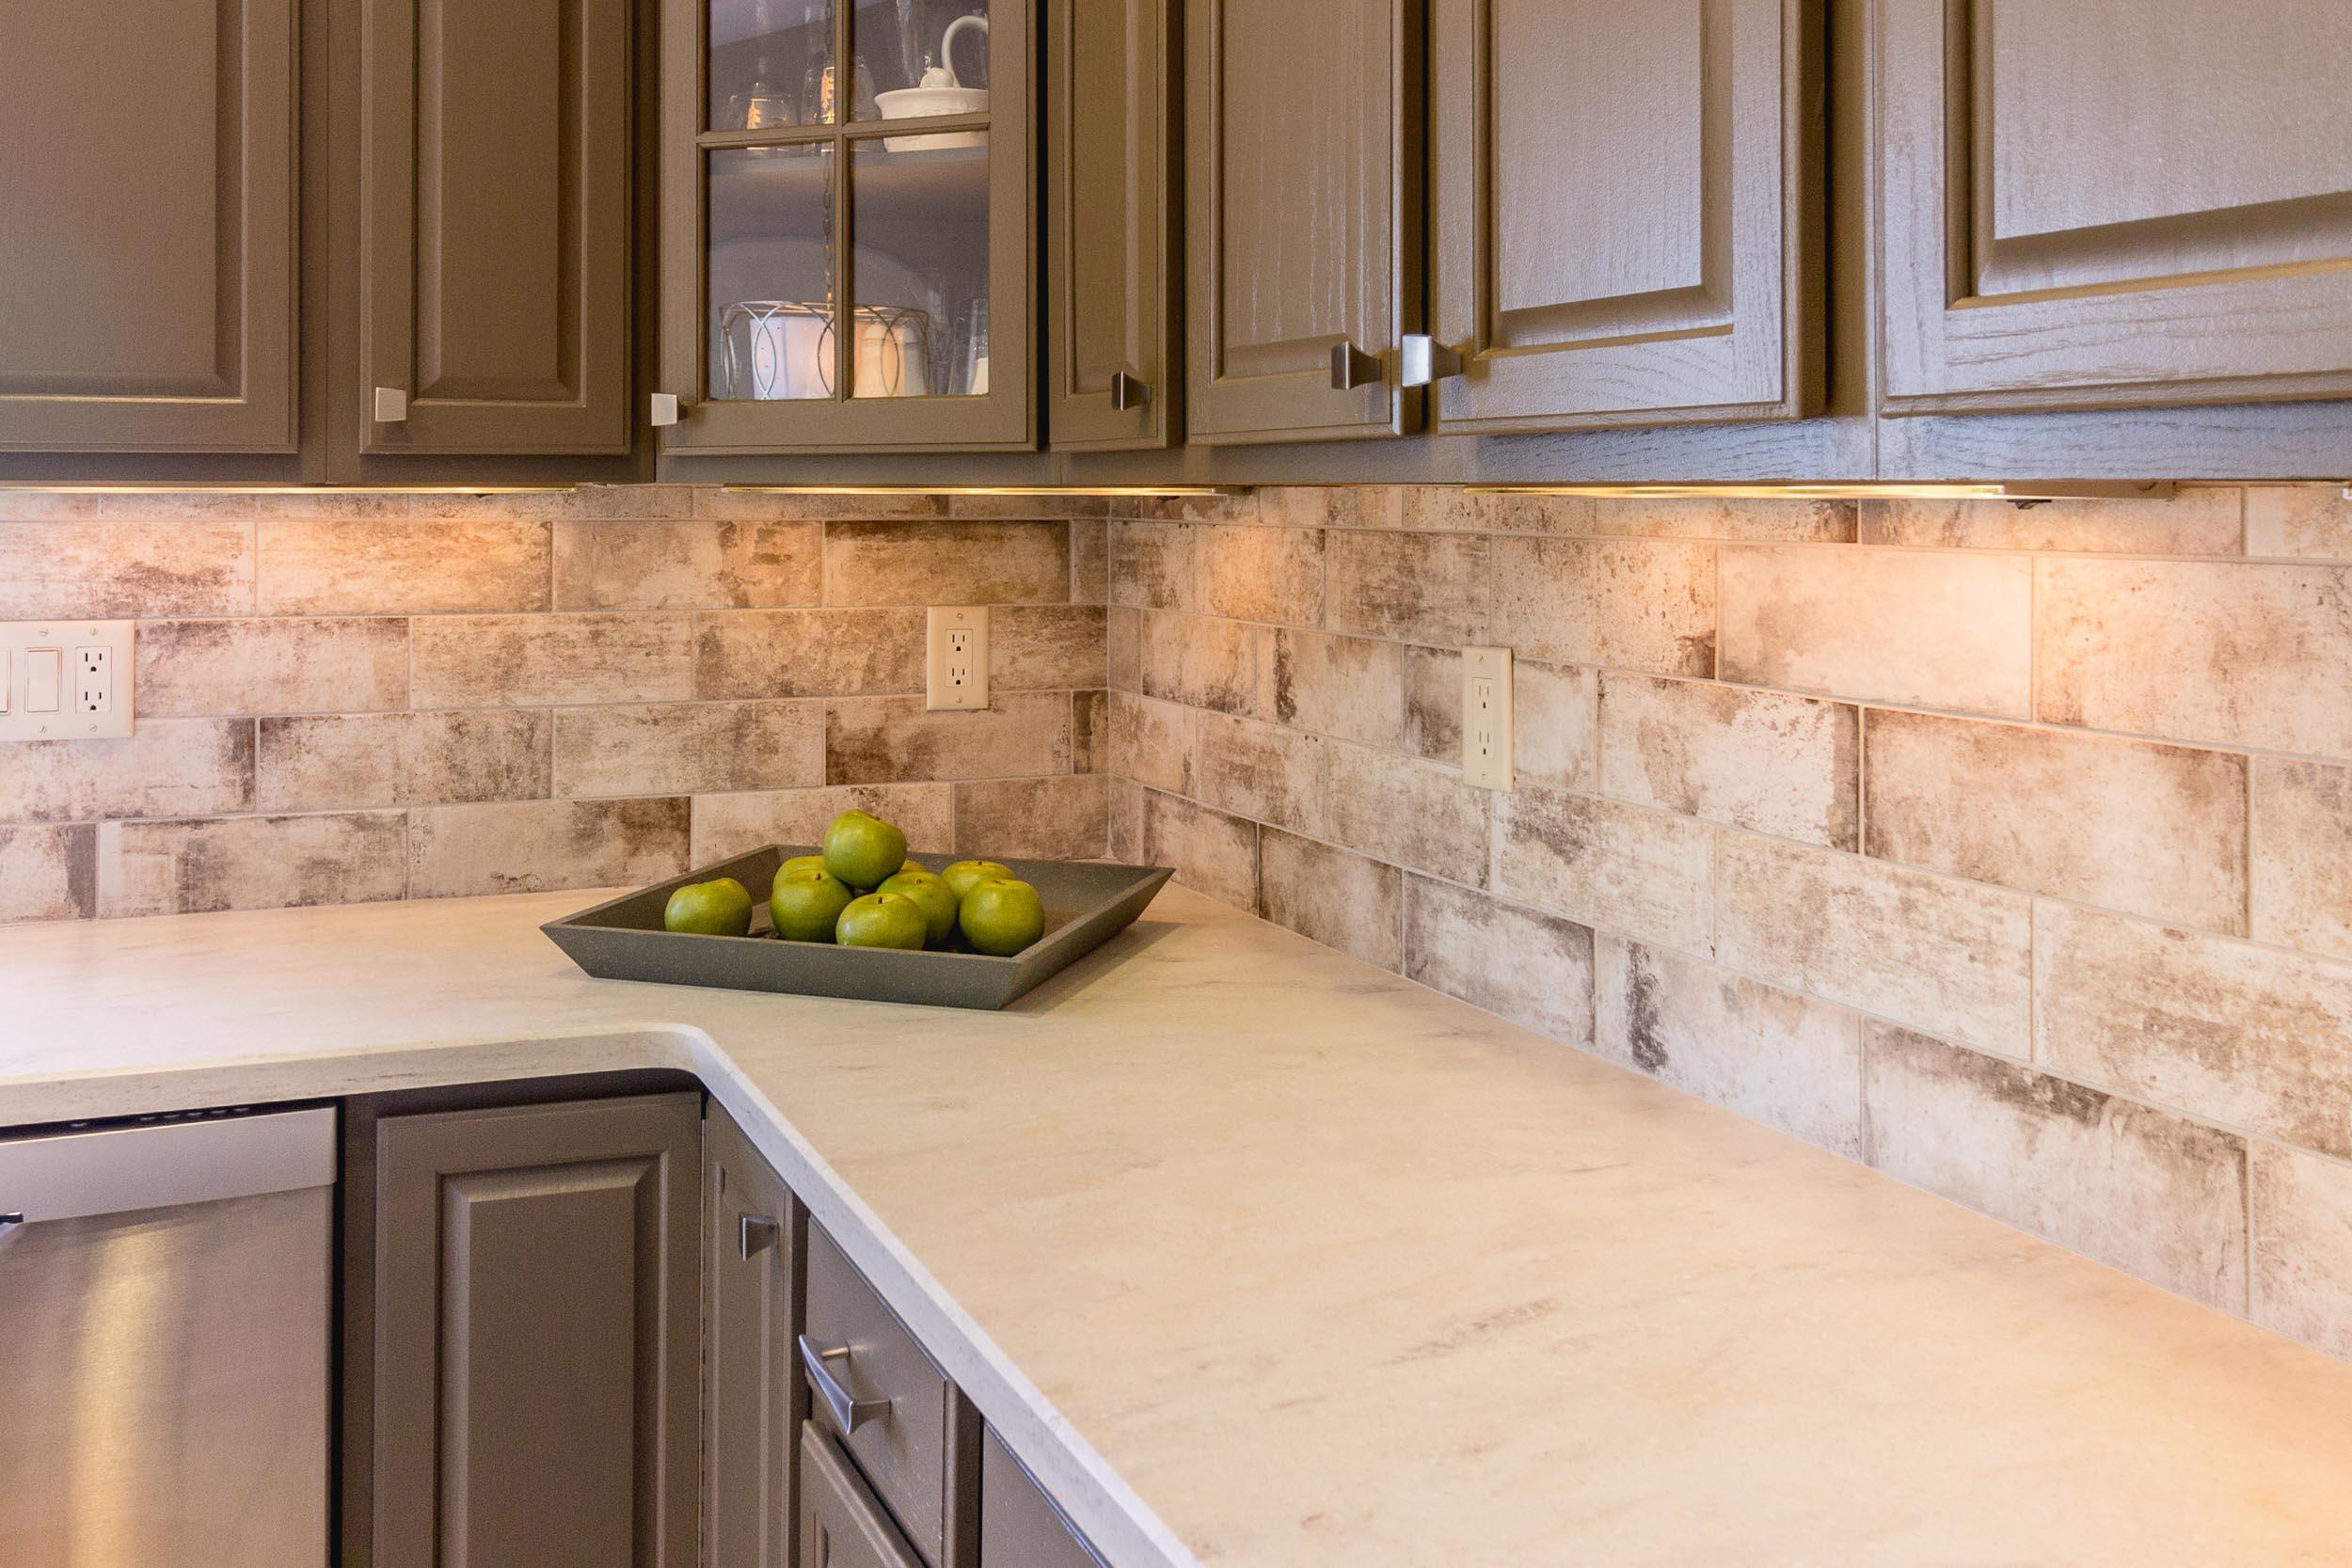 Corian Clamshell Countertop with Cantina Bianco Backsplash Tile